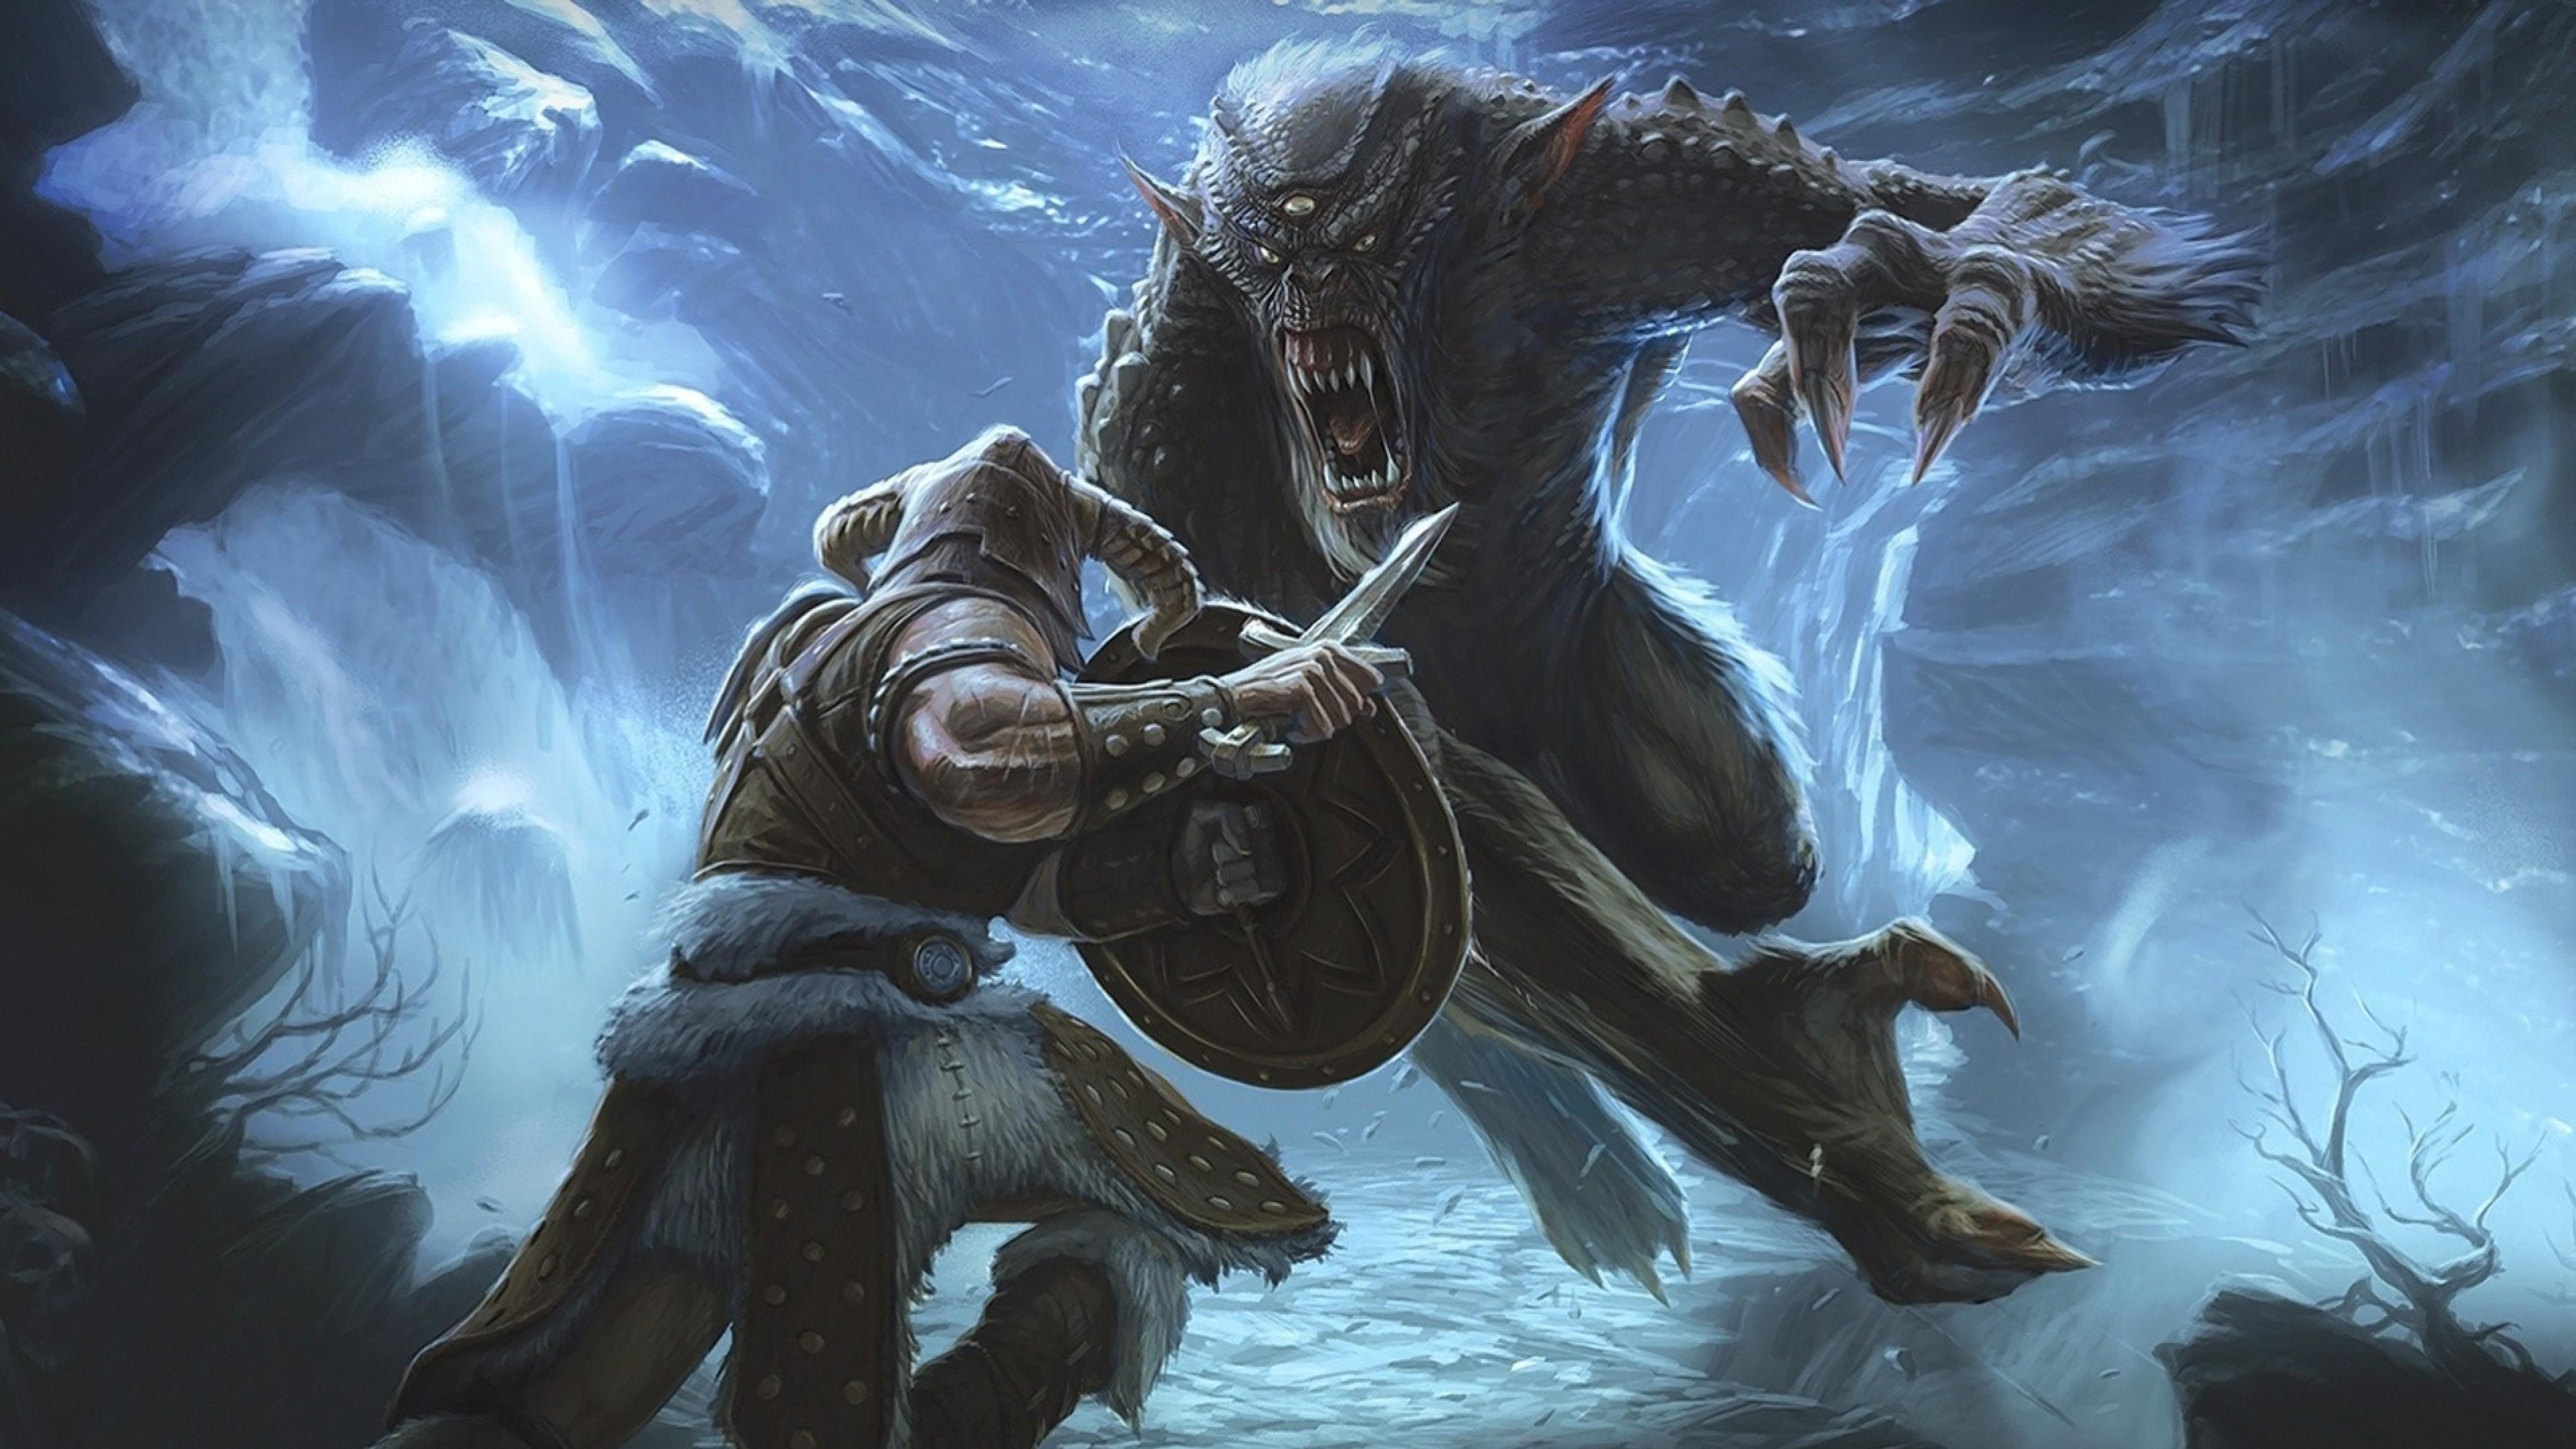 Wallpaper elder scrolls 5, skyrim, battle